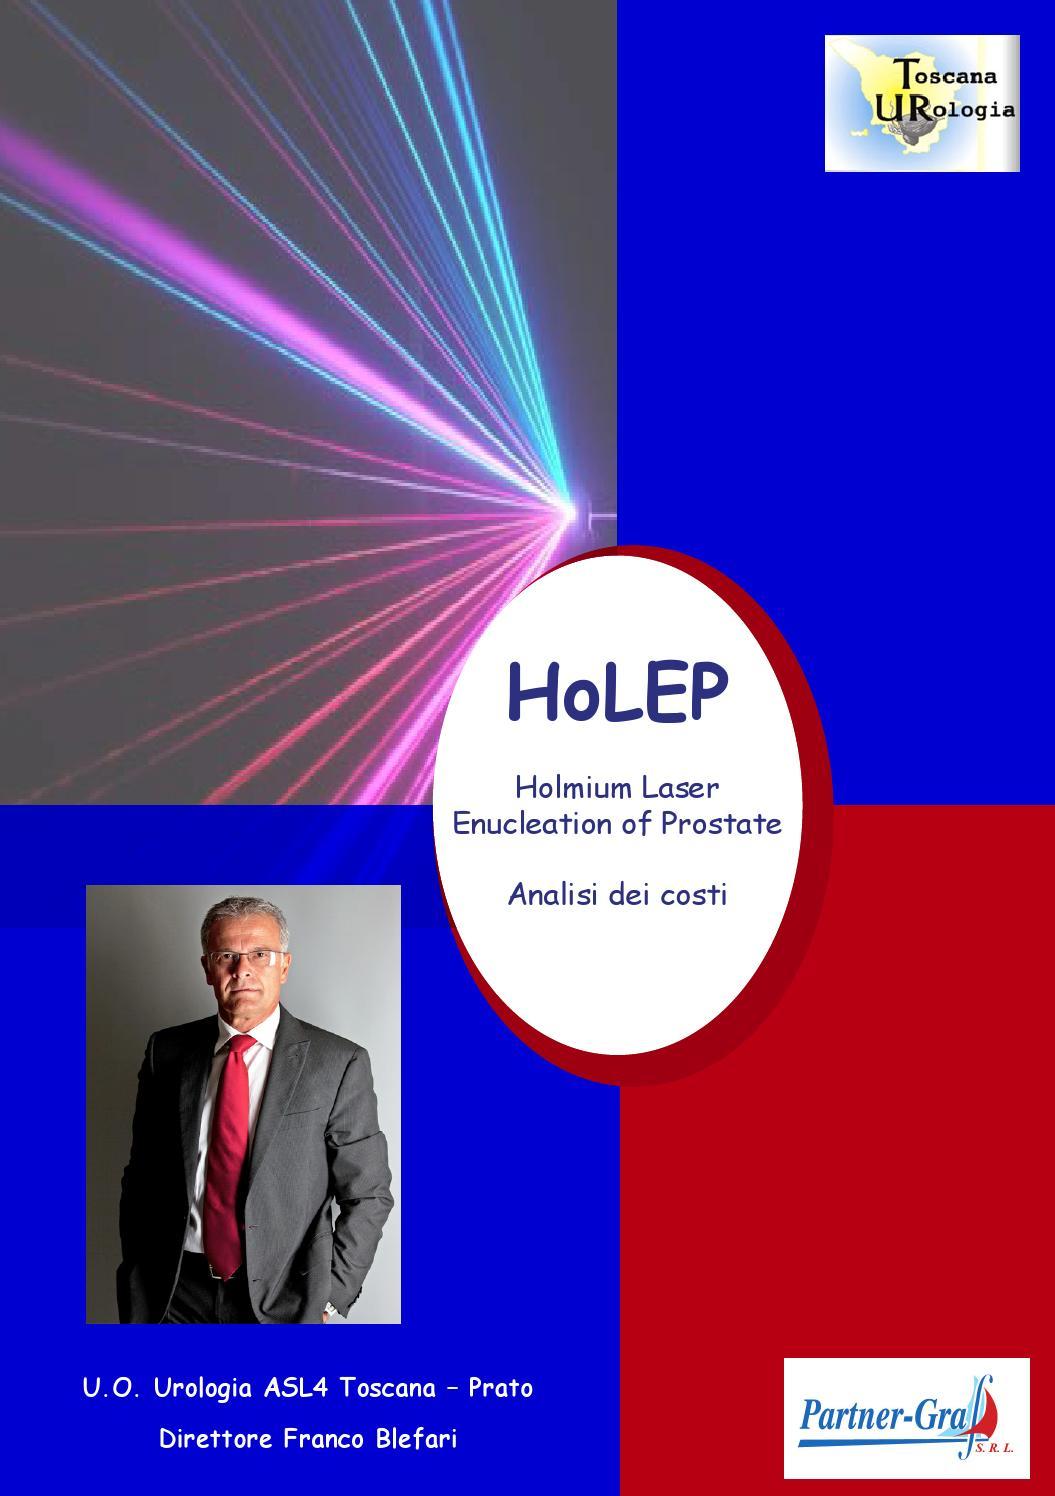 intervento alla prostata con laser holmios